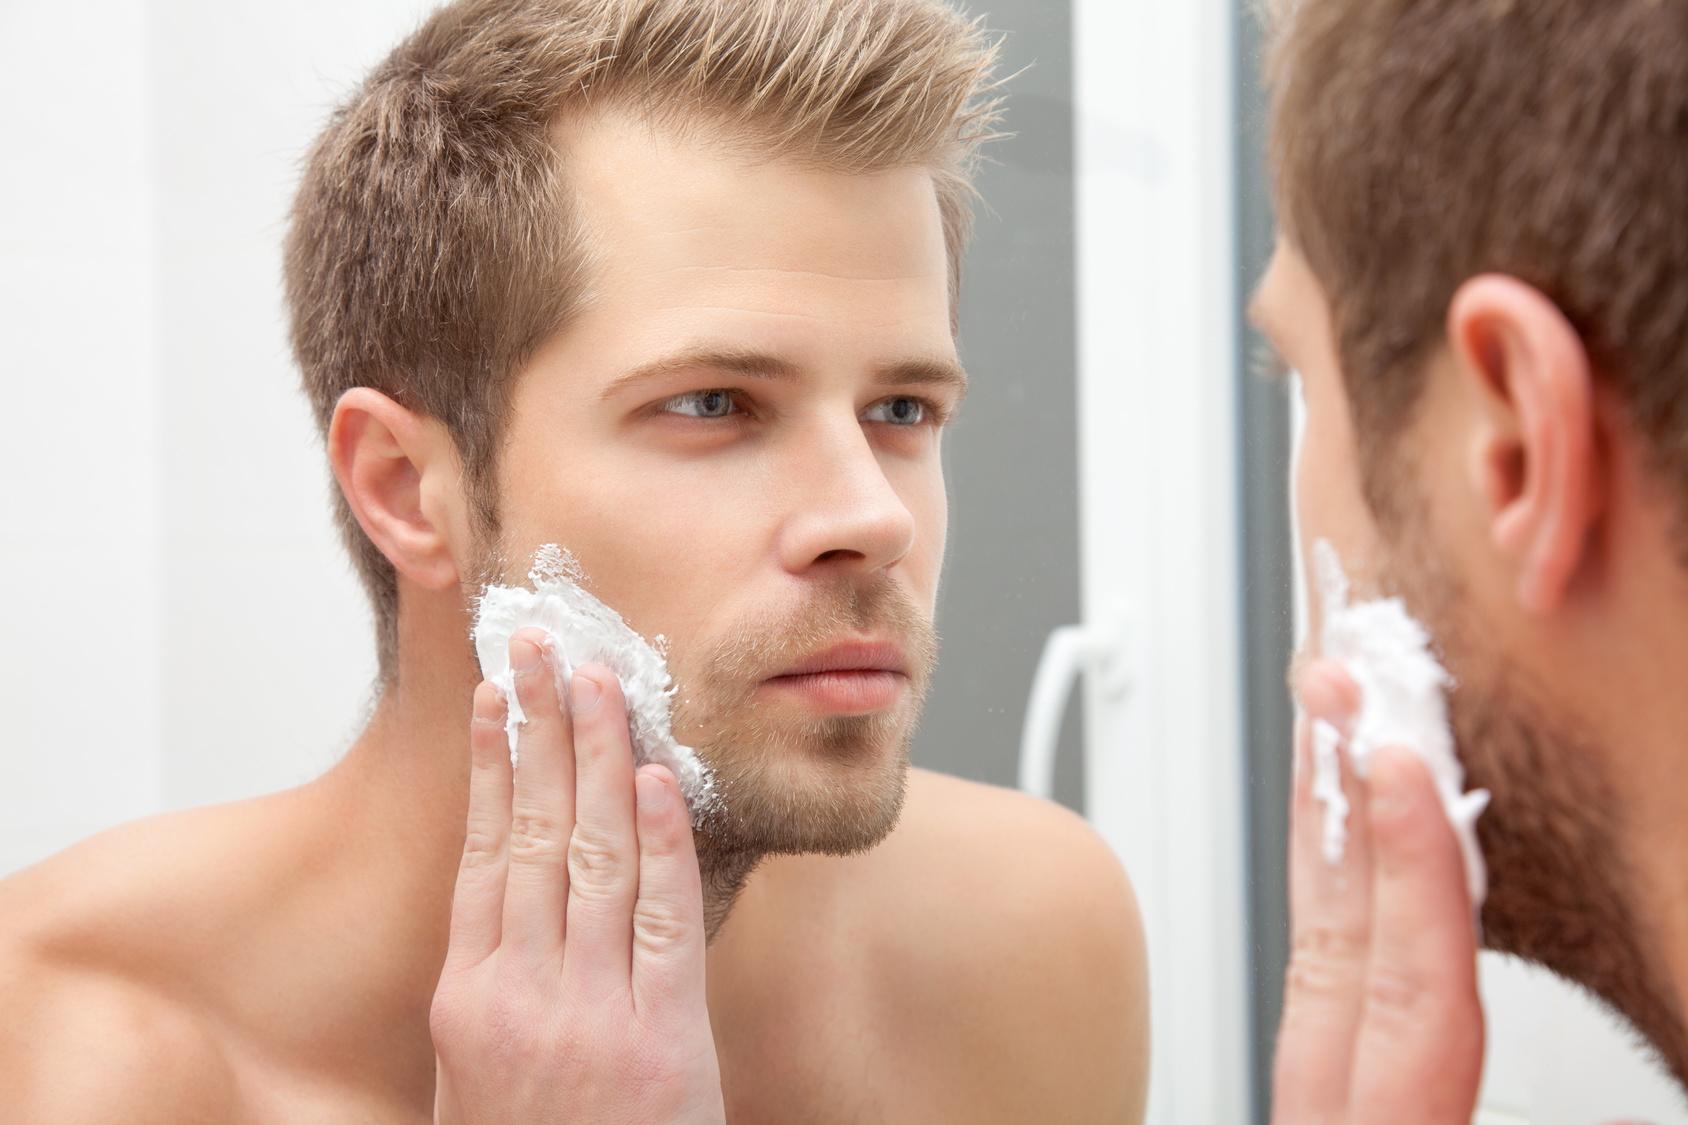 Rasiergel, Rasiercreme und Rasierseife